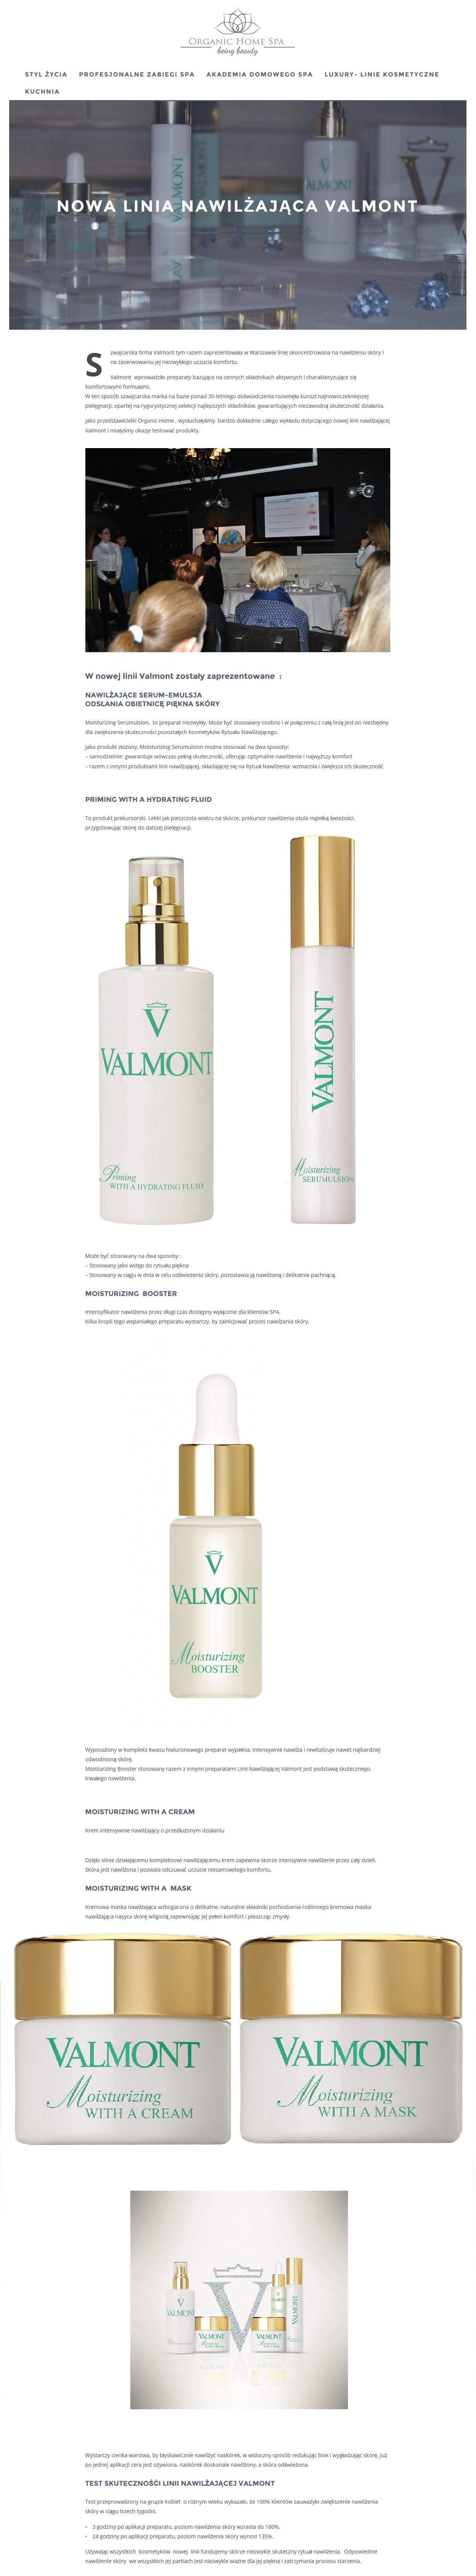 2016.03.12_OrganicHomeSPA.pl_VALMONT Hydration Line